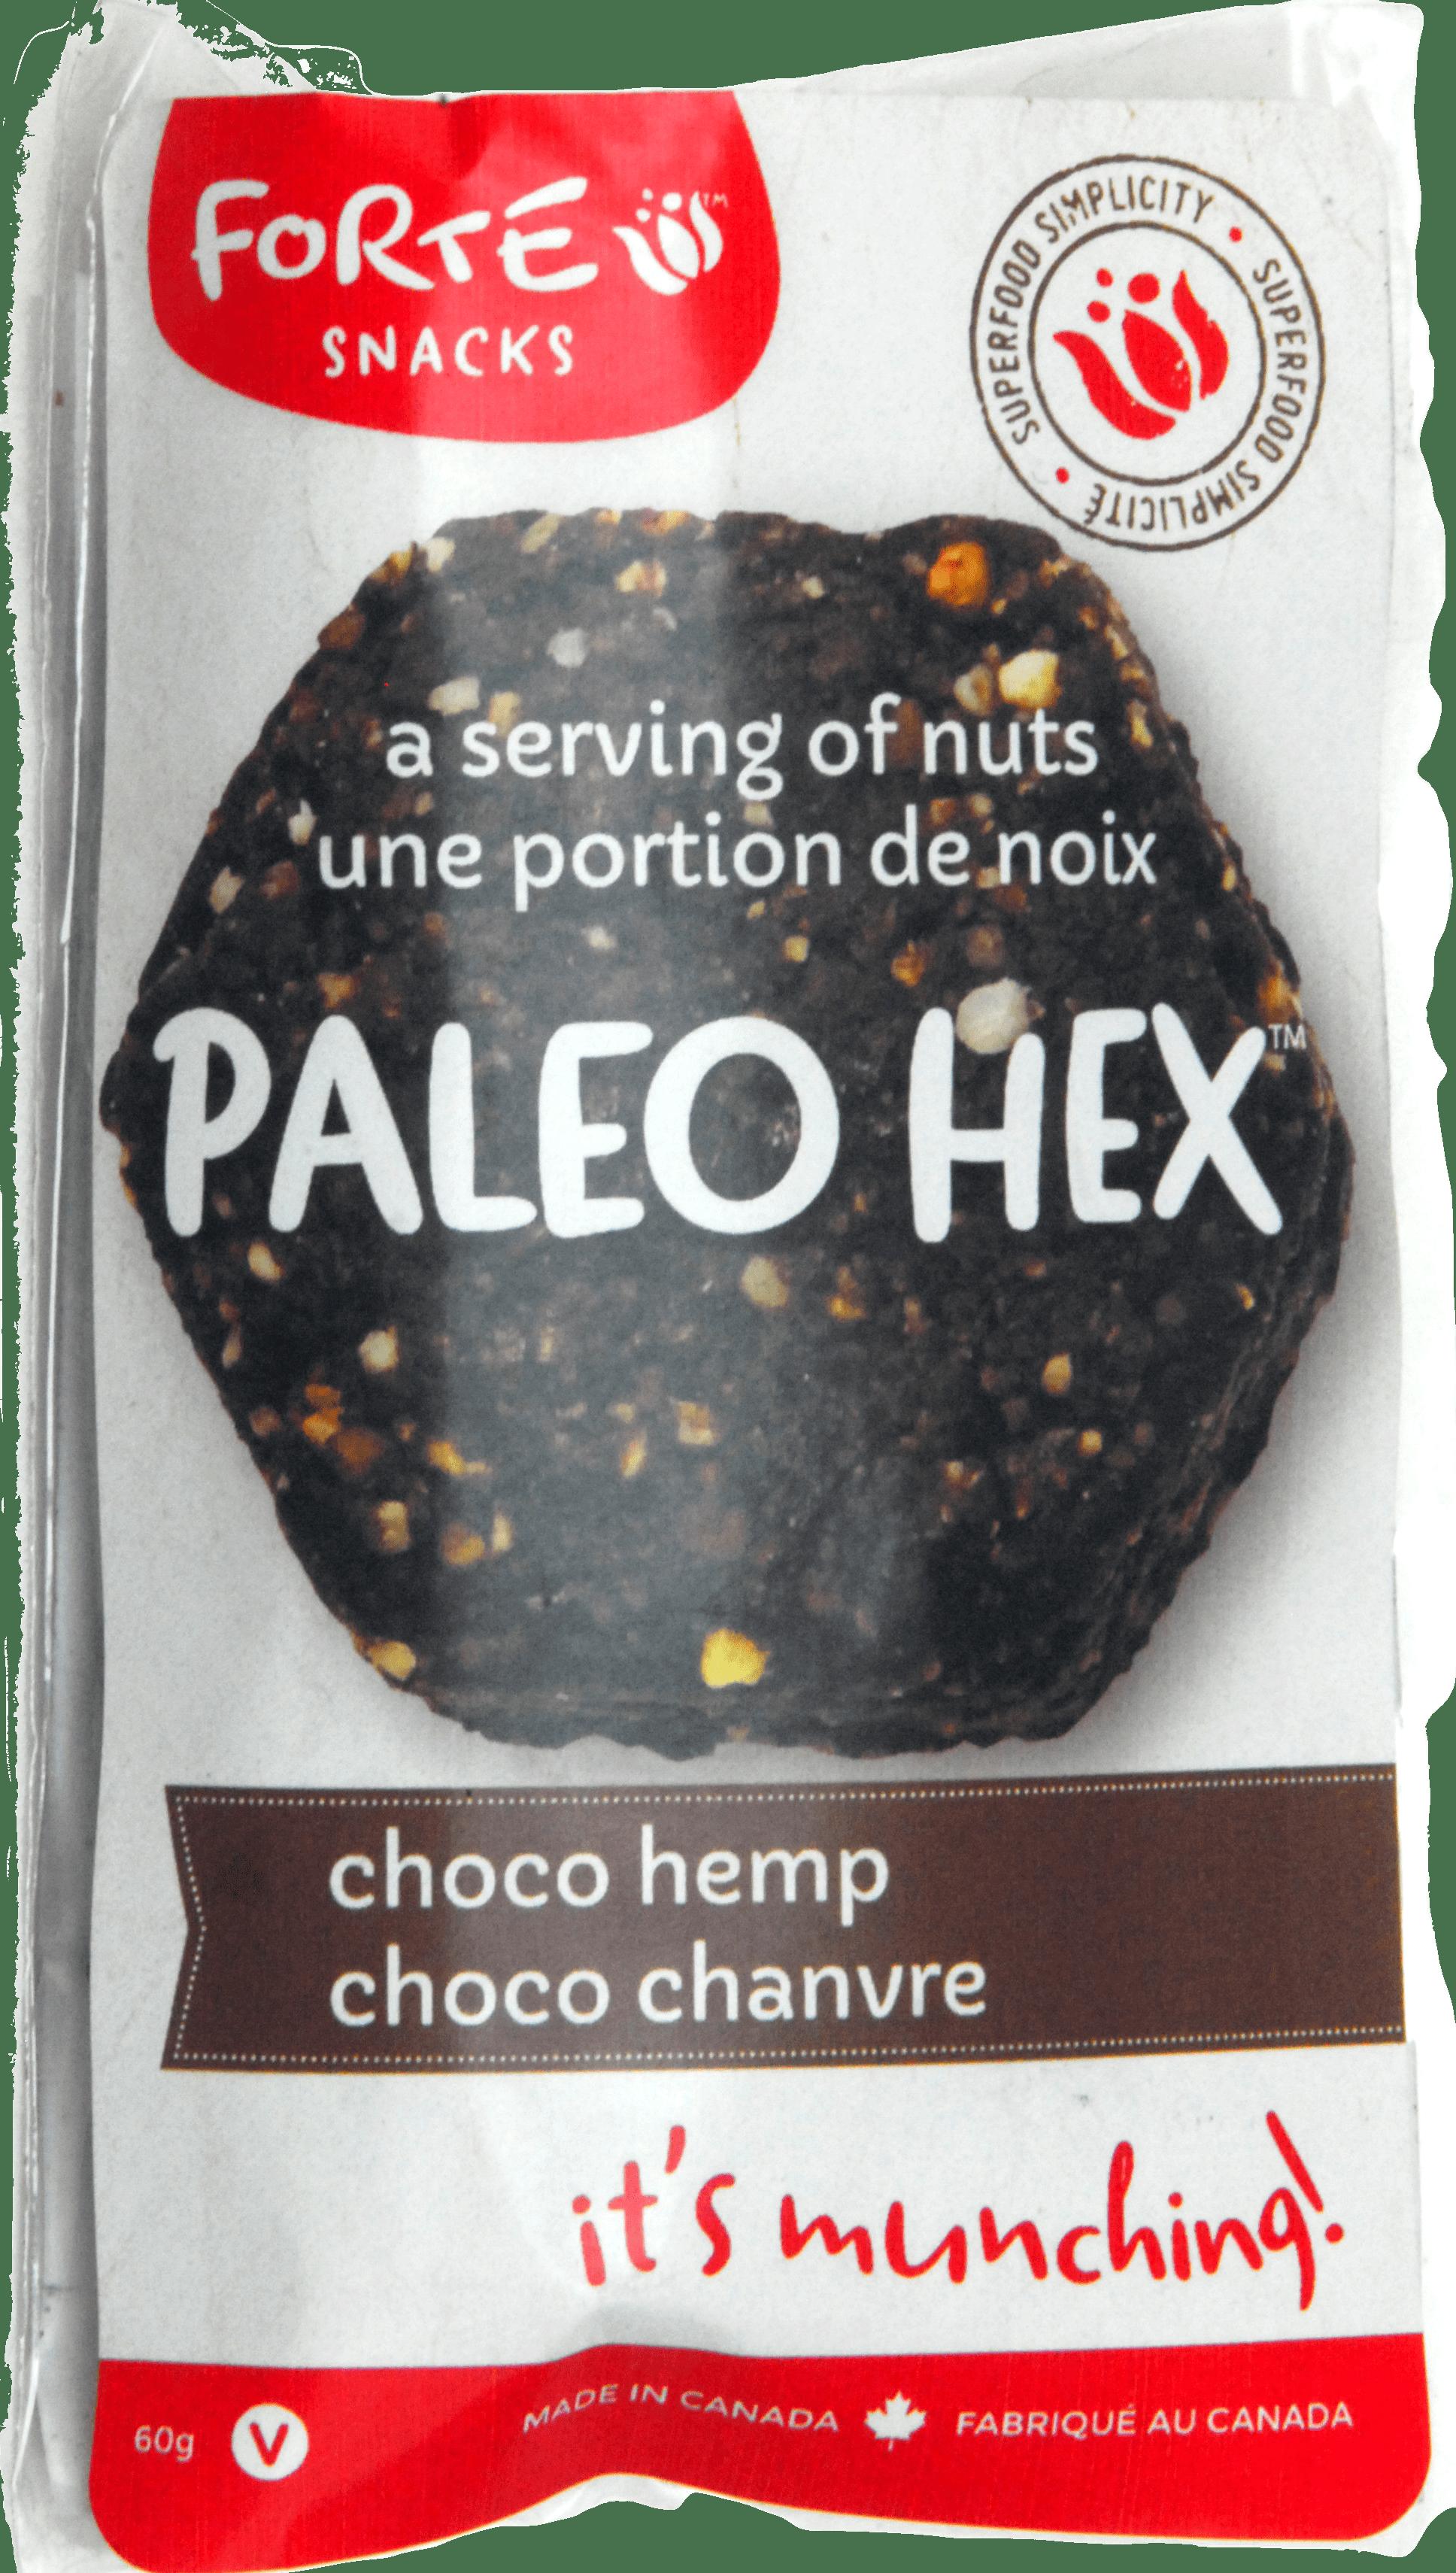 Choc-Hemp snack label